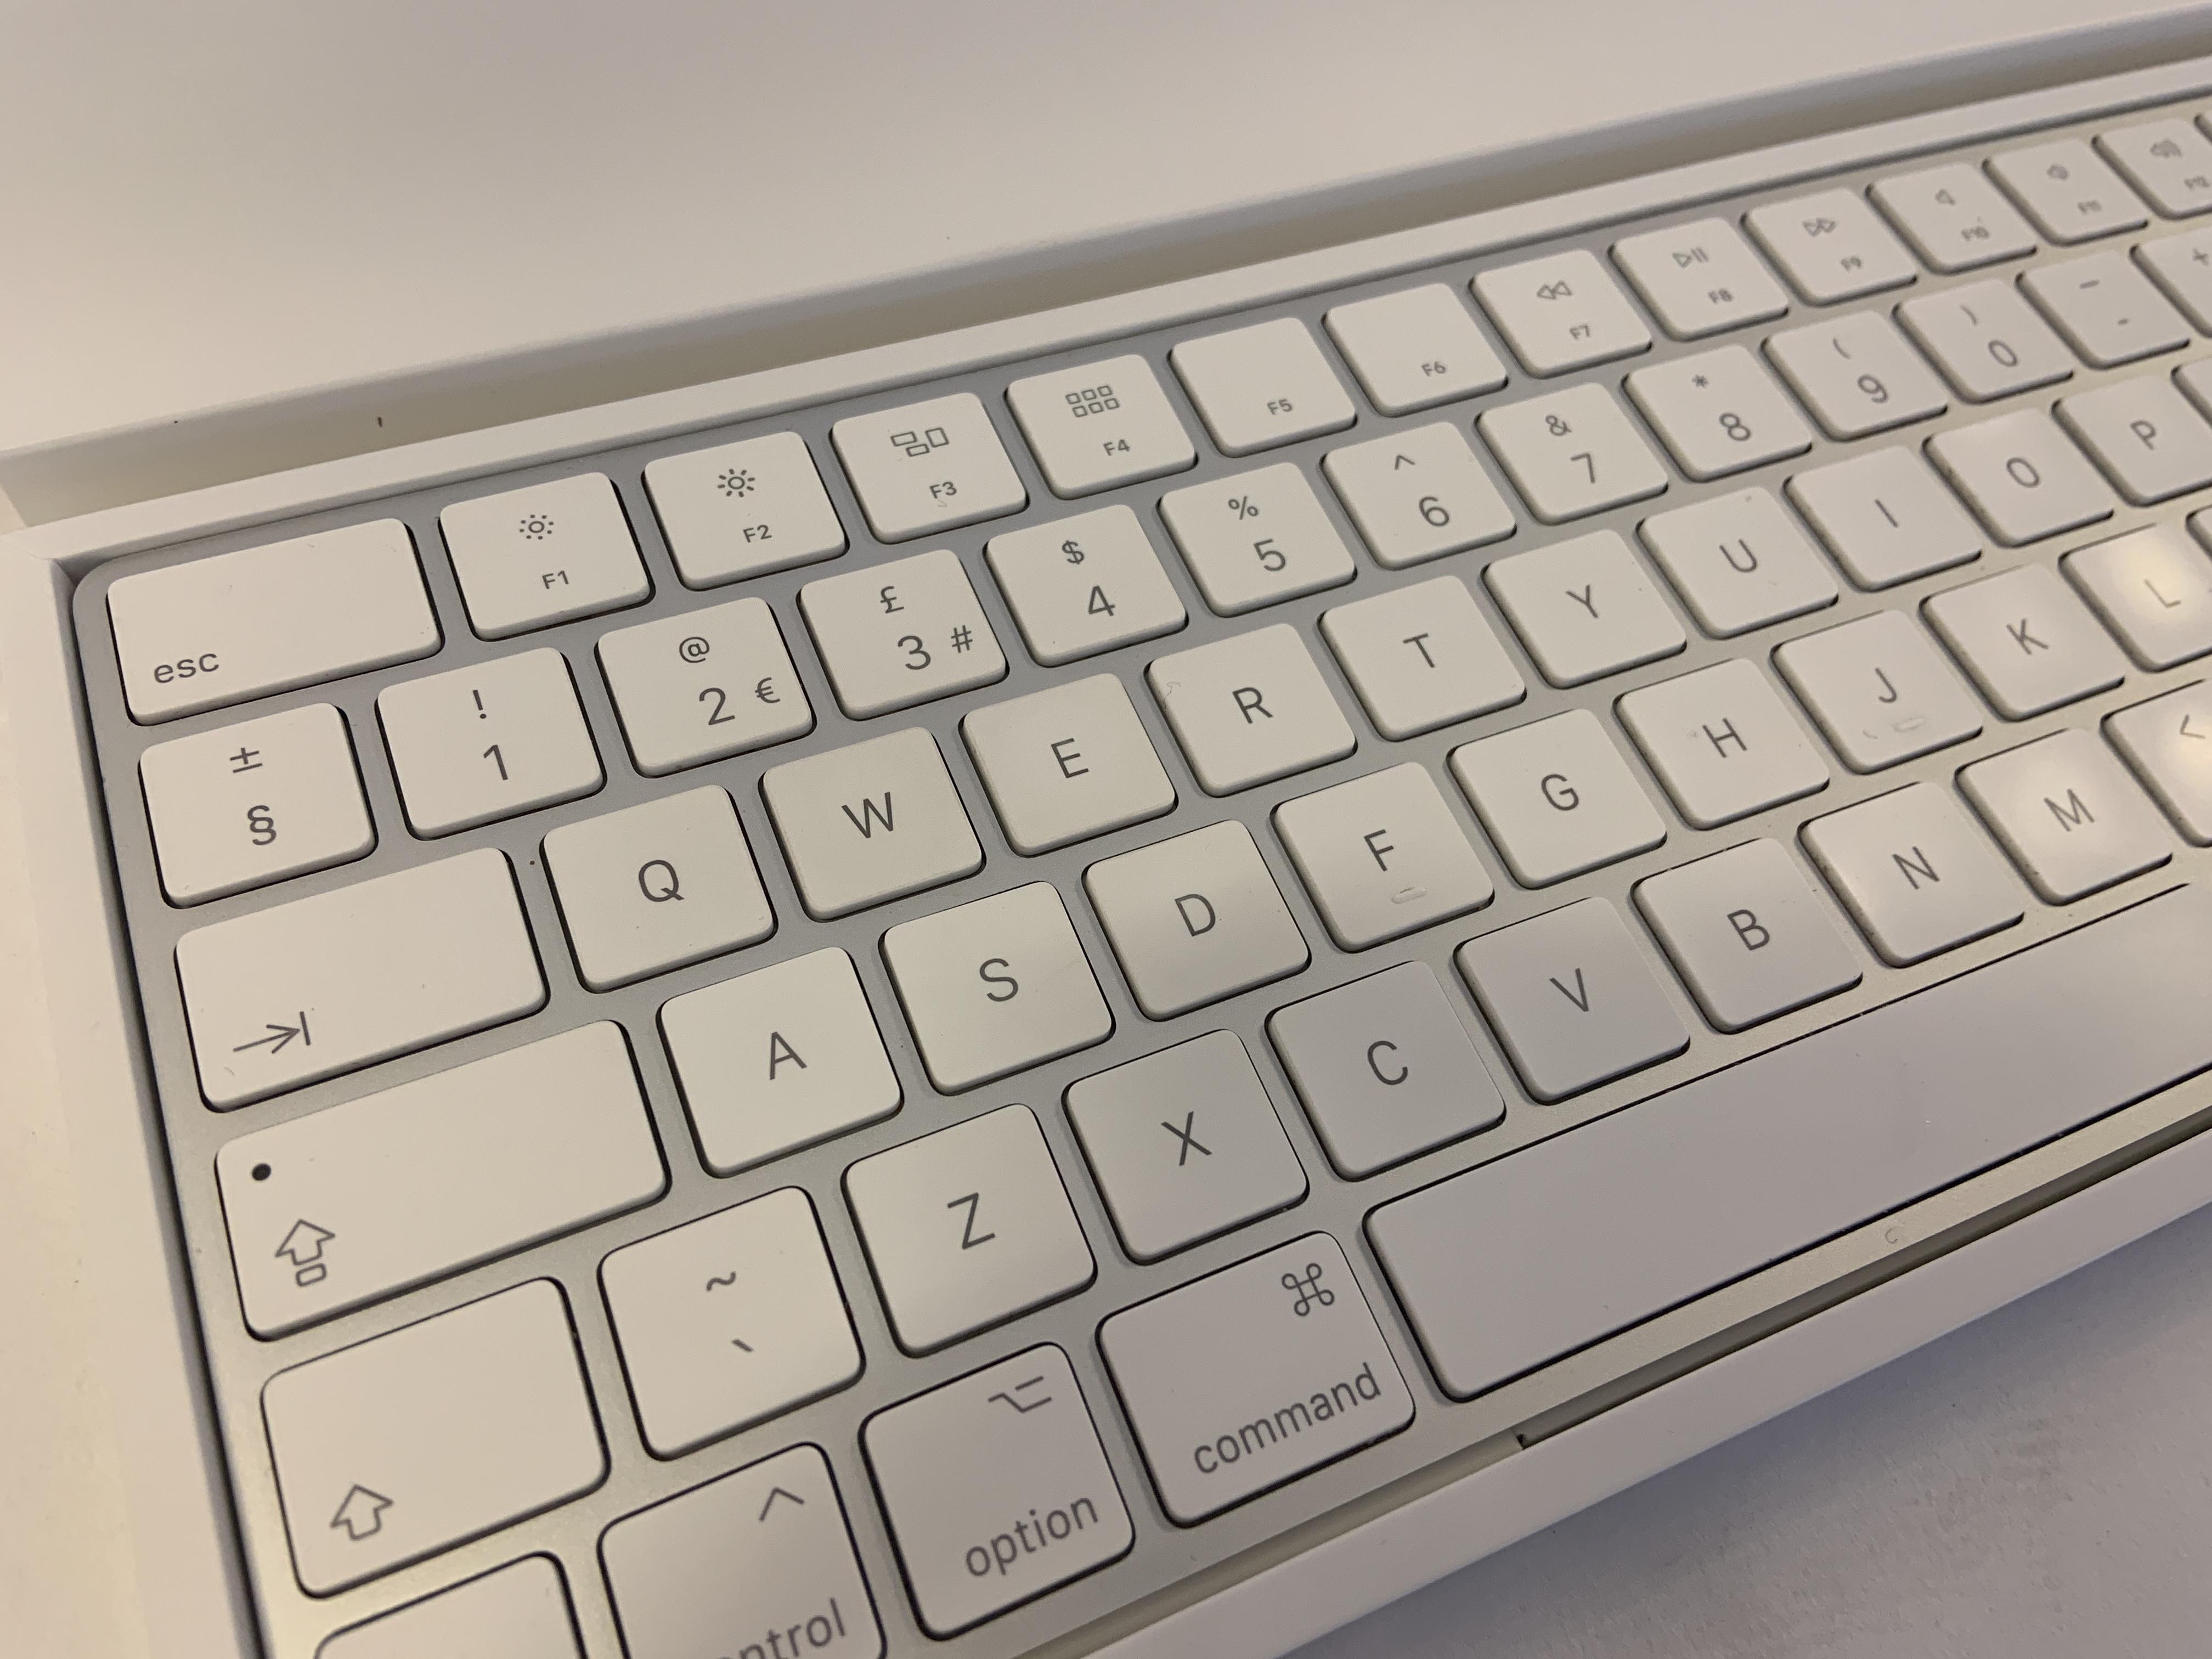 "iMac 27"" Retina 5K Mid 2017 (Intel Quad-Core i5 3.8 GHz 32 GB RAM 2 TB Fusion Drive), Intel Quad-Core i5 3.8 GHz, 32 GB RAM, 2 TB Fusion Drive, image 4"